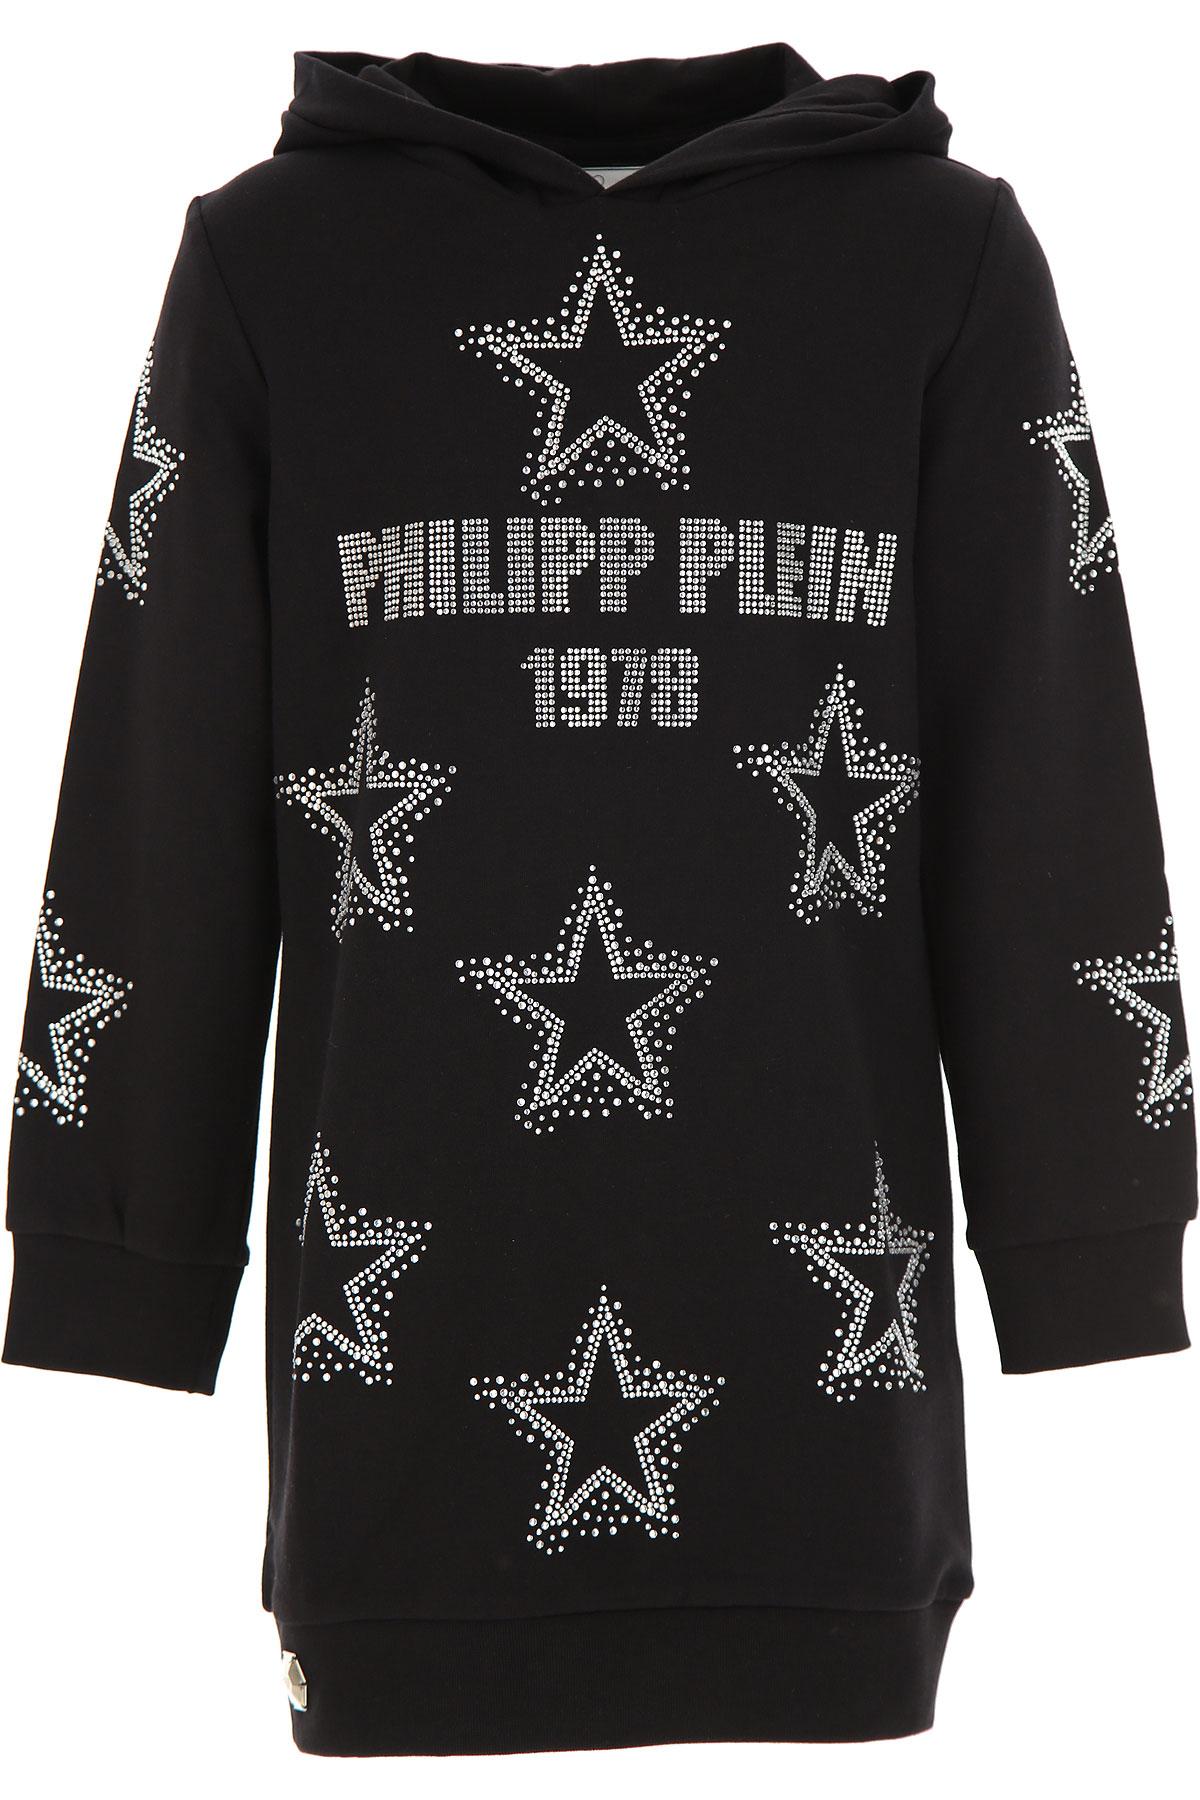 Philipp Plein Kids Sweatshirts & Hoodies for Girls On Sale, Black, Cotton, 2019, 10Y 14Y 8Y